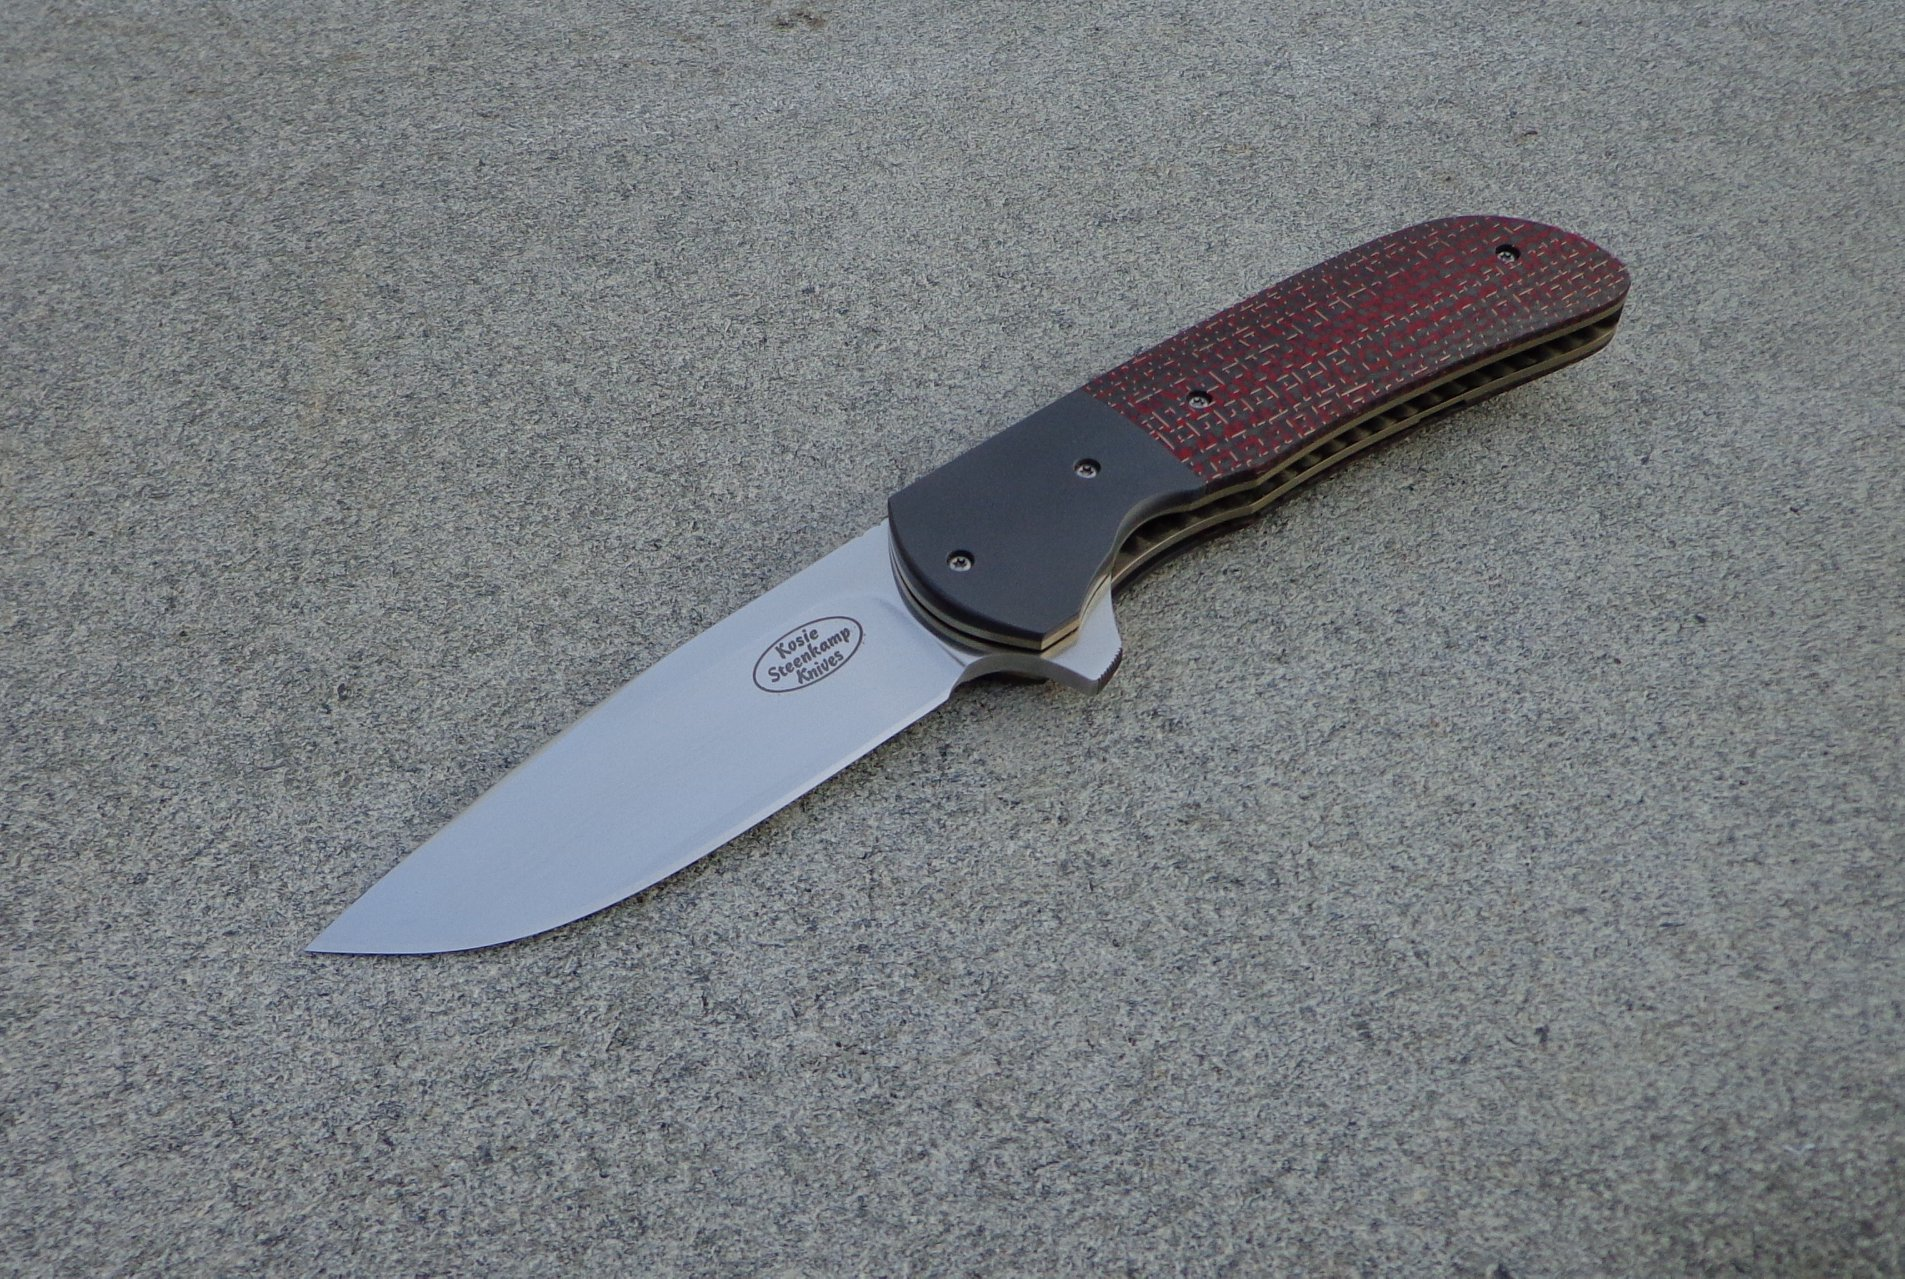 Knife: Piuma Flipper Liner Lock - IKBS. Blade: Böhler M390 Stainless Steel. Liners: Titanium, anodized golden. Bolsters: Zirconium. Handle scales: Red Lightning Strike Carbon Fiber with anodized Titanium belt clip.